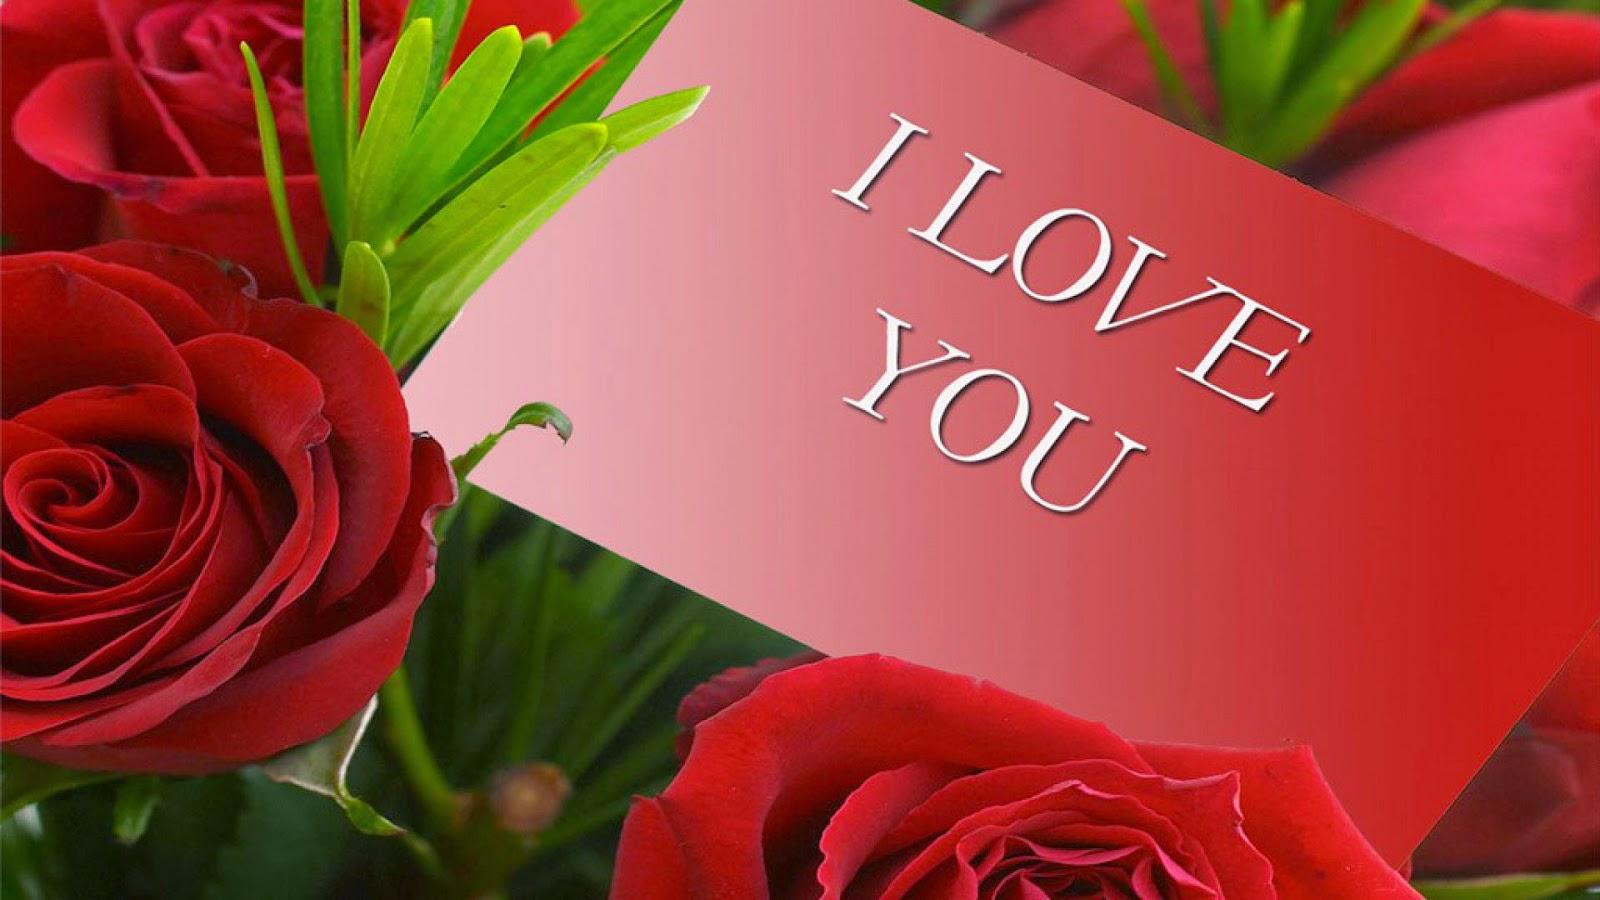 hinh nen valentine cho may tinh